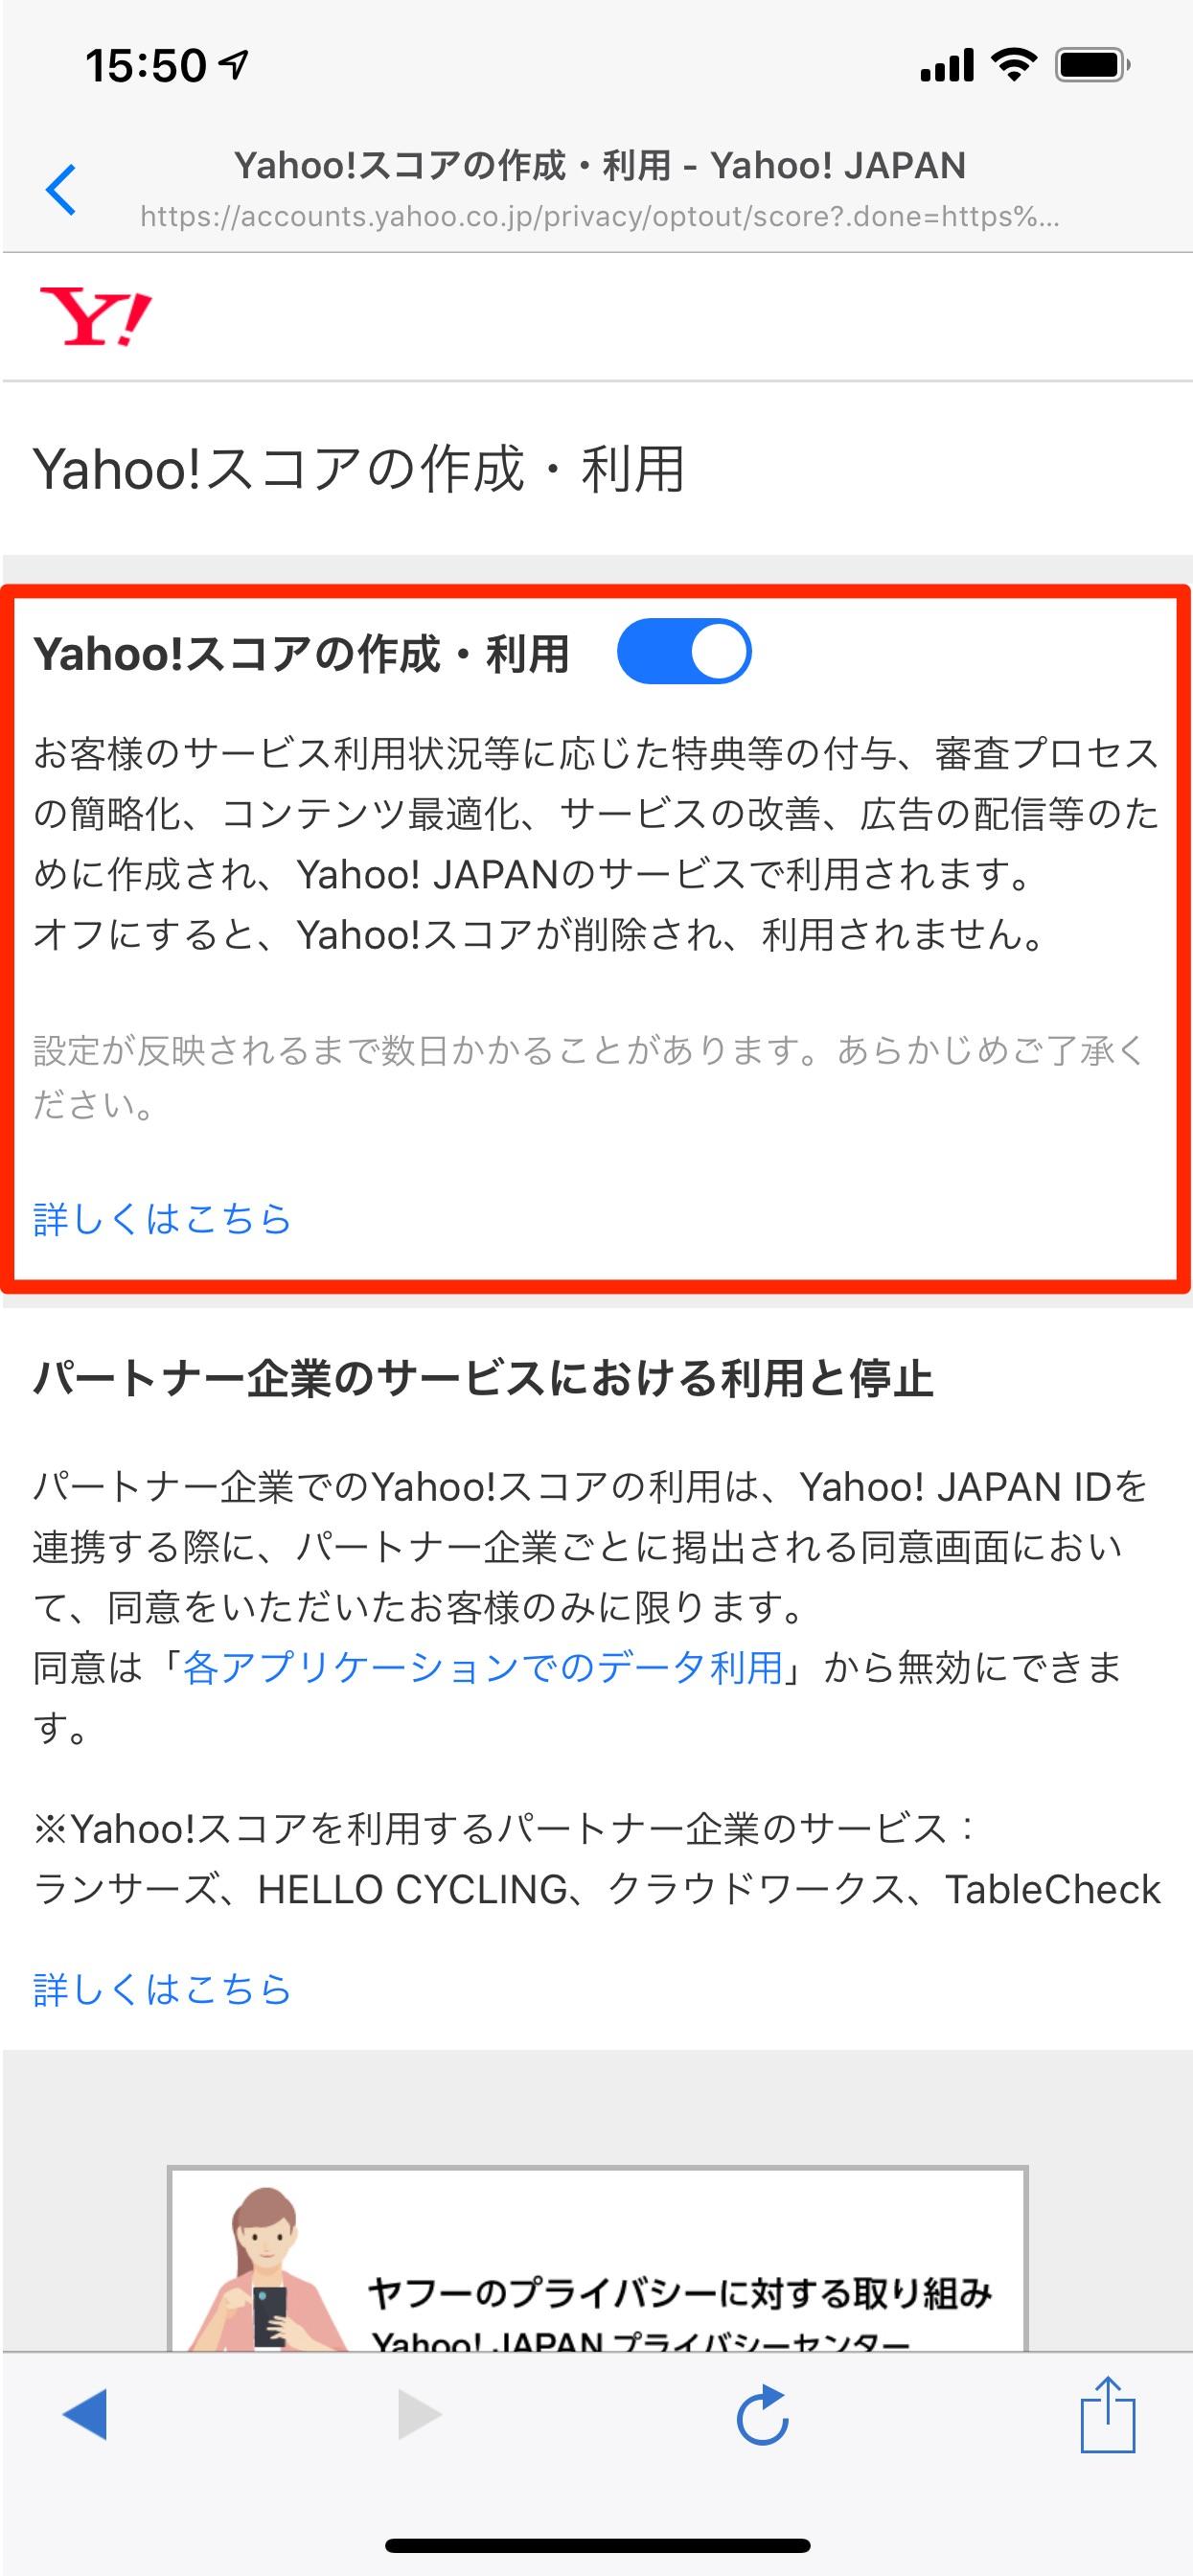 yahoo-score-newsapp-8